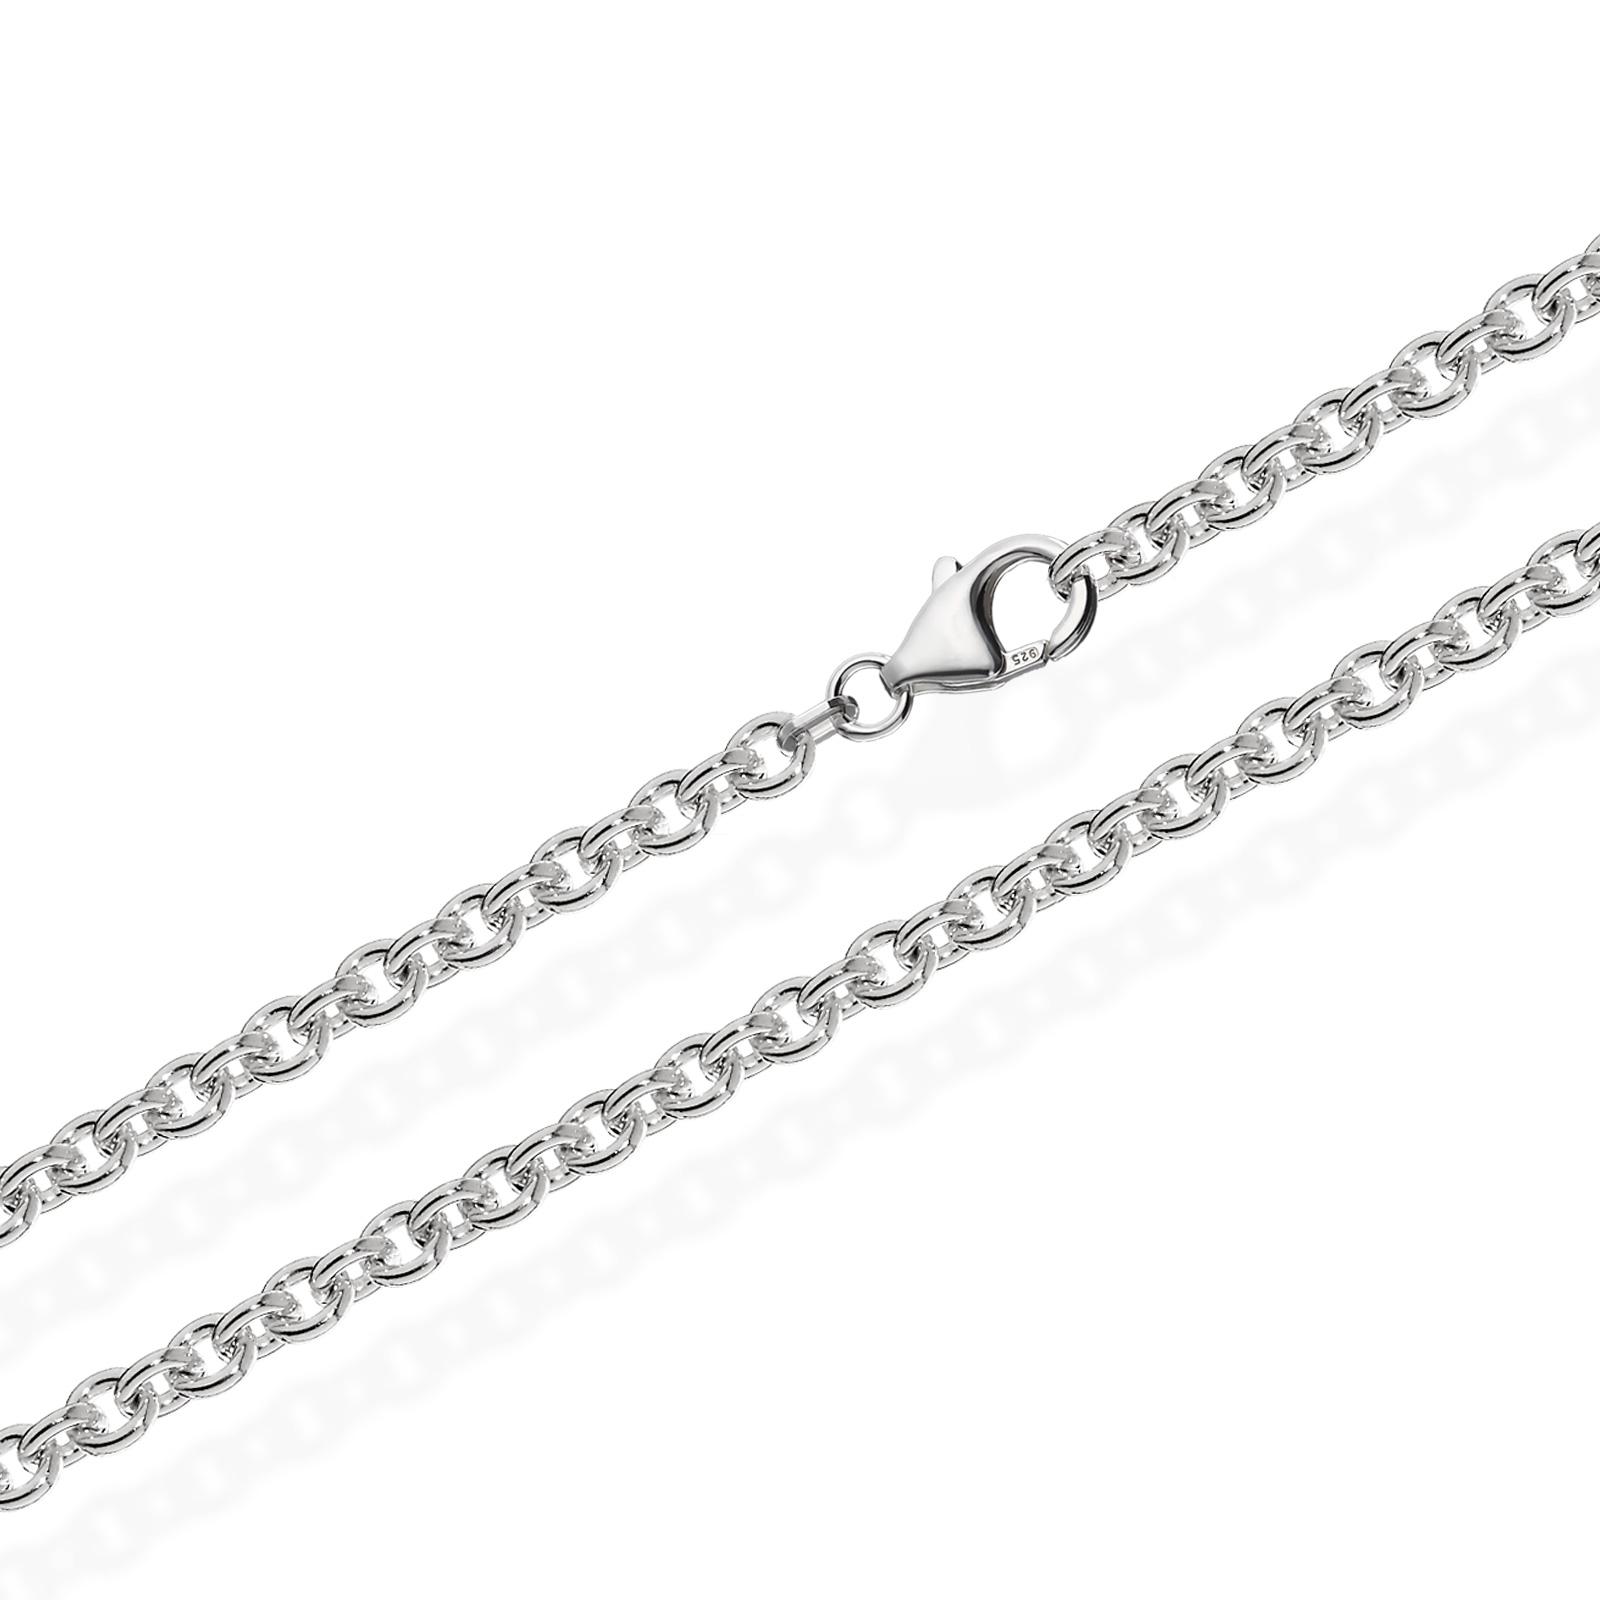 40144217c307 90cm ANKERKETTE 925 Sterling Silber Kette Rund MASSIV Collier 33,5gr 4,00mm  3539